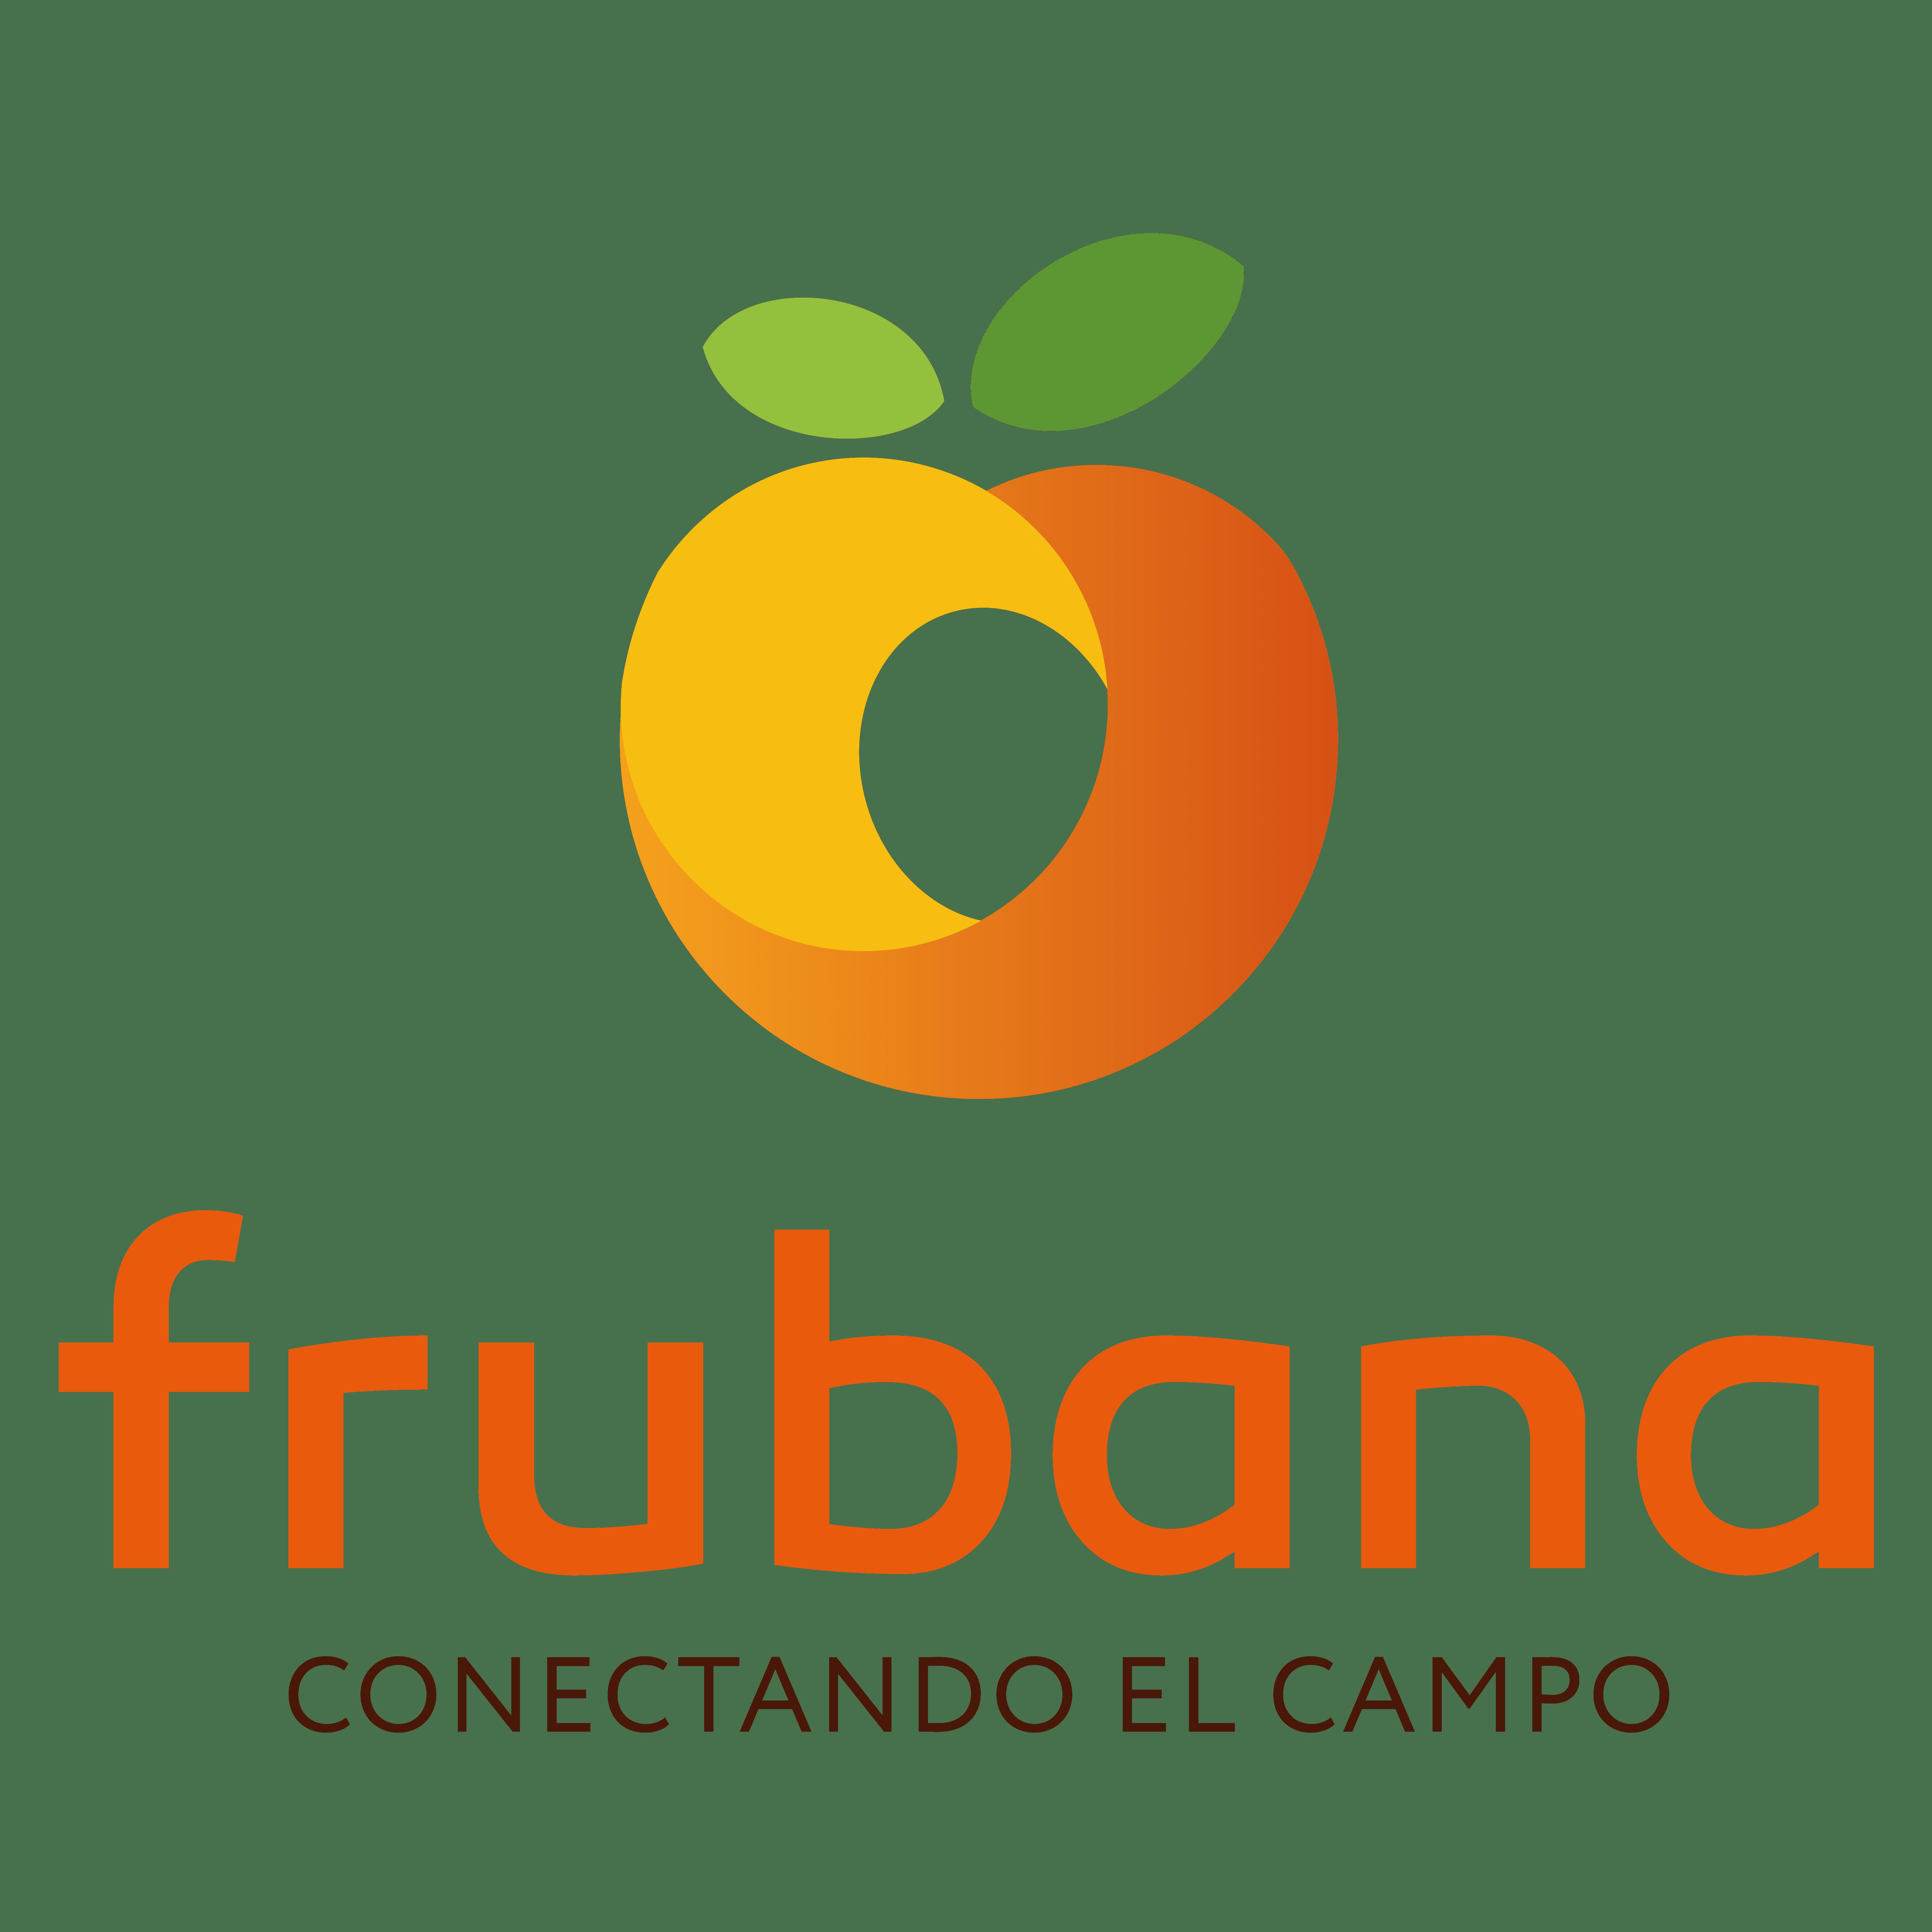 Frubana icon